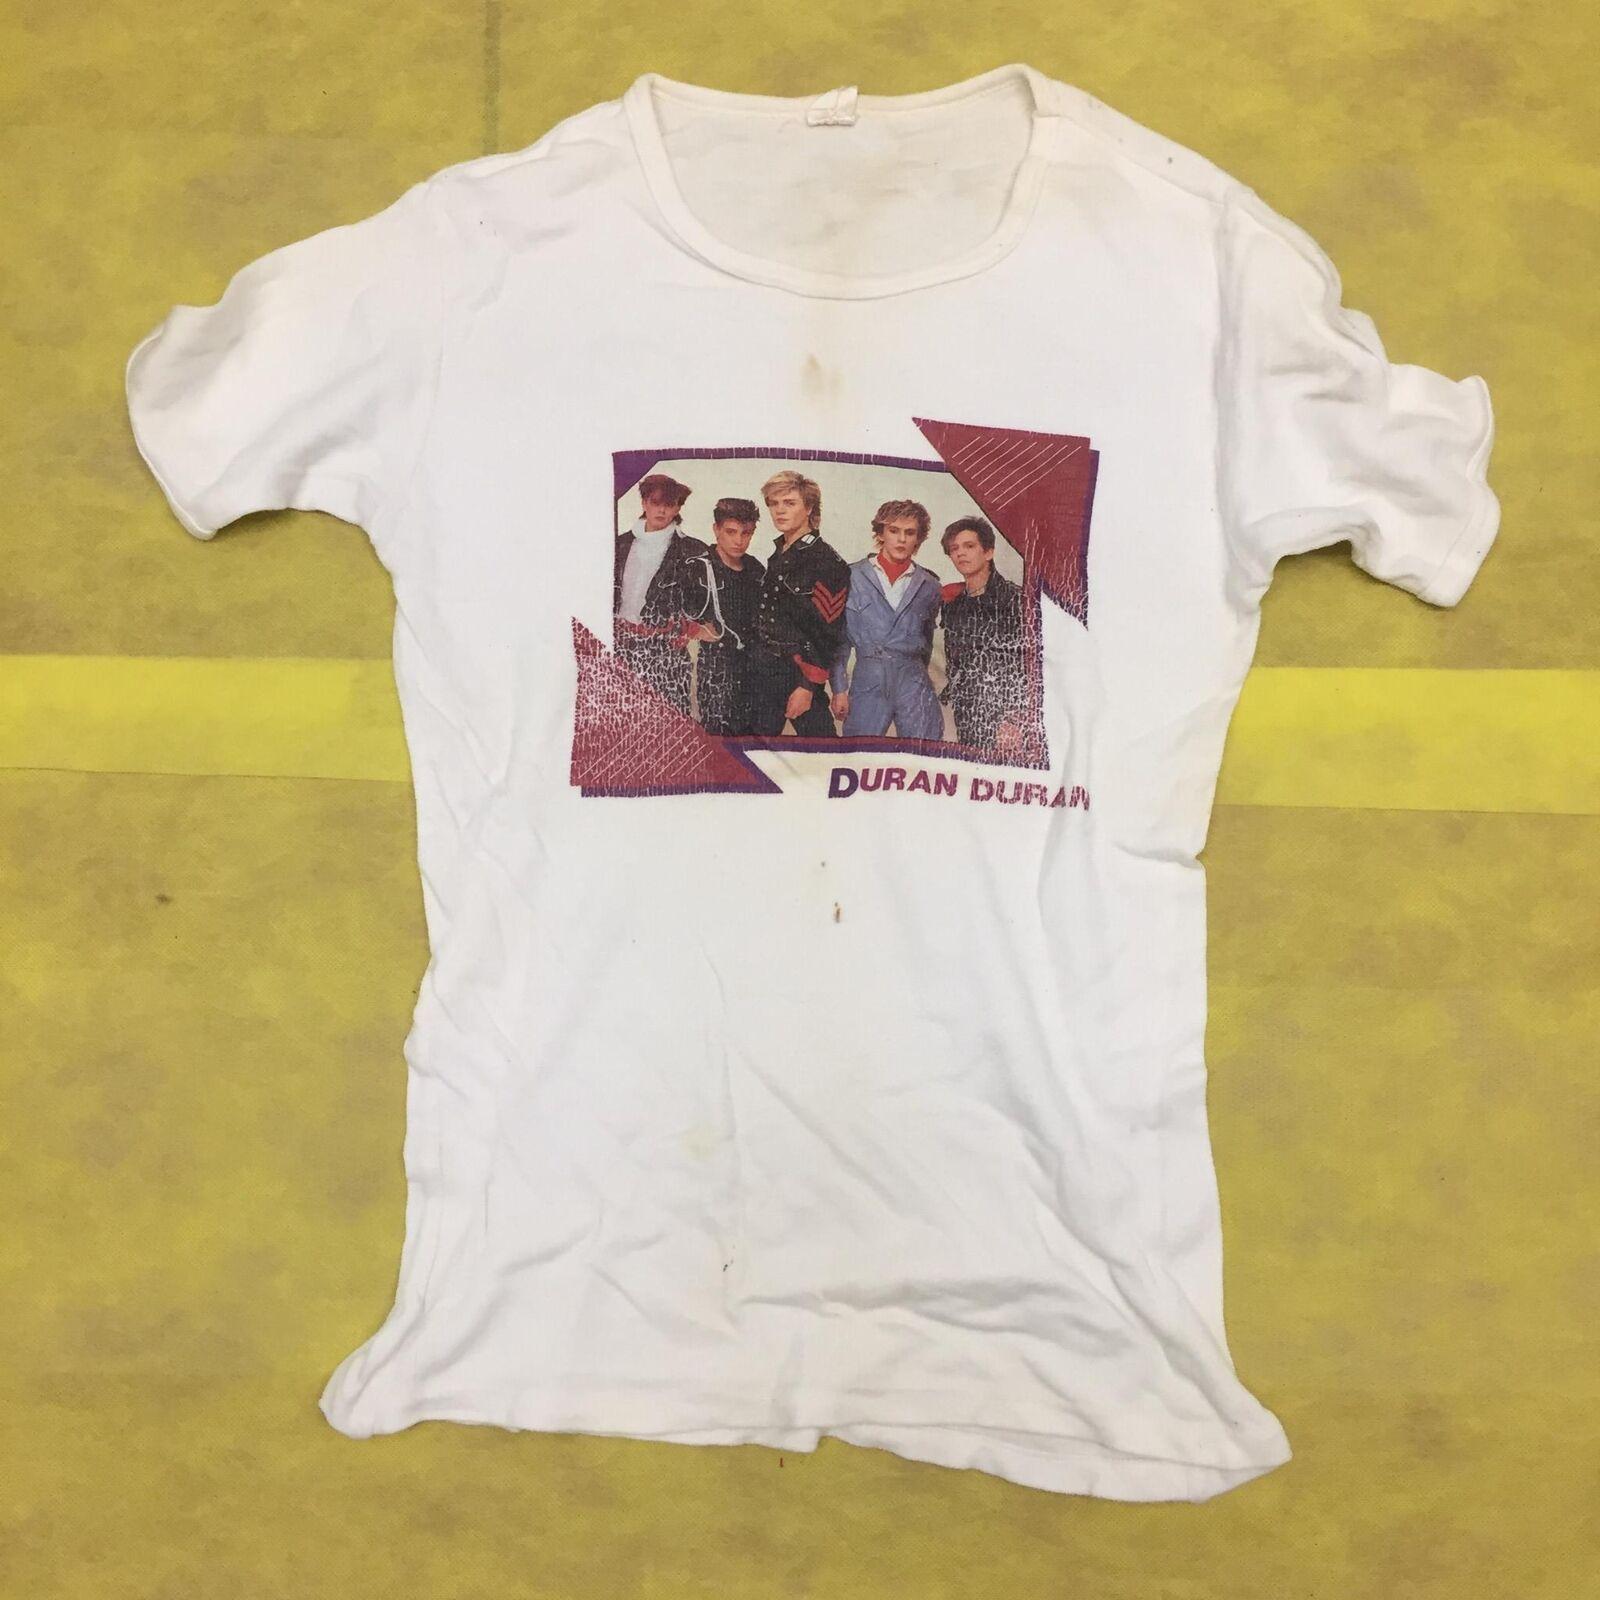 Duran Duran Vintage 1980's Mens Graphic Music Group T Shirt